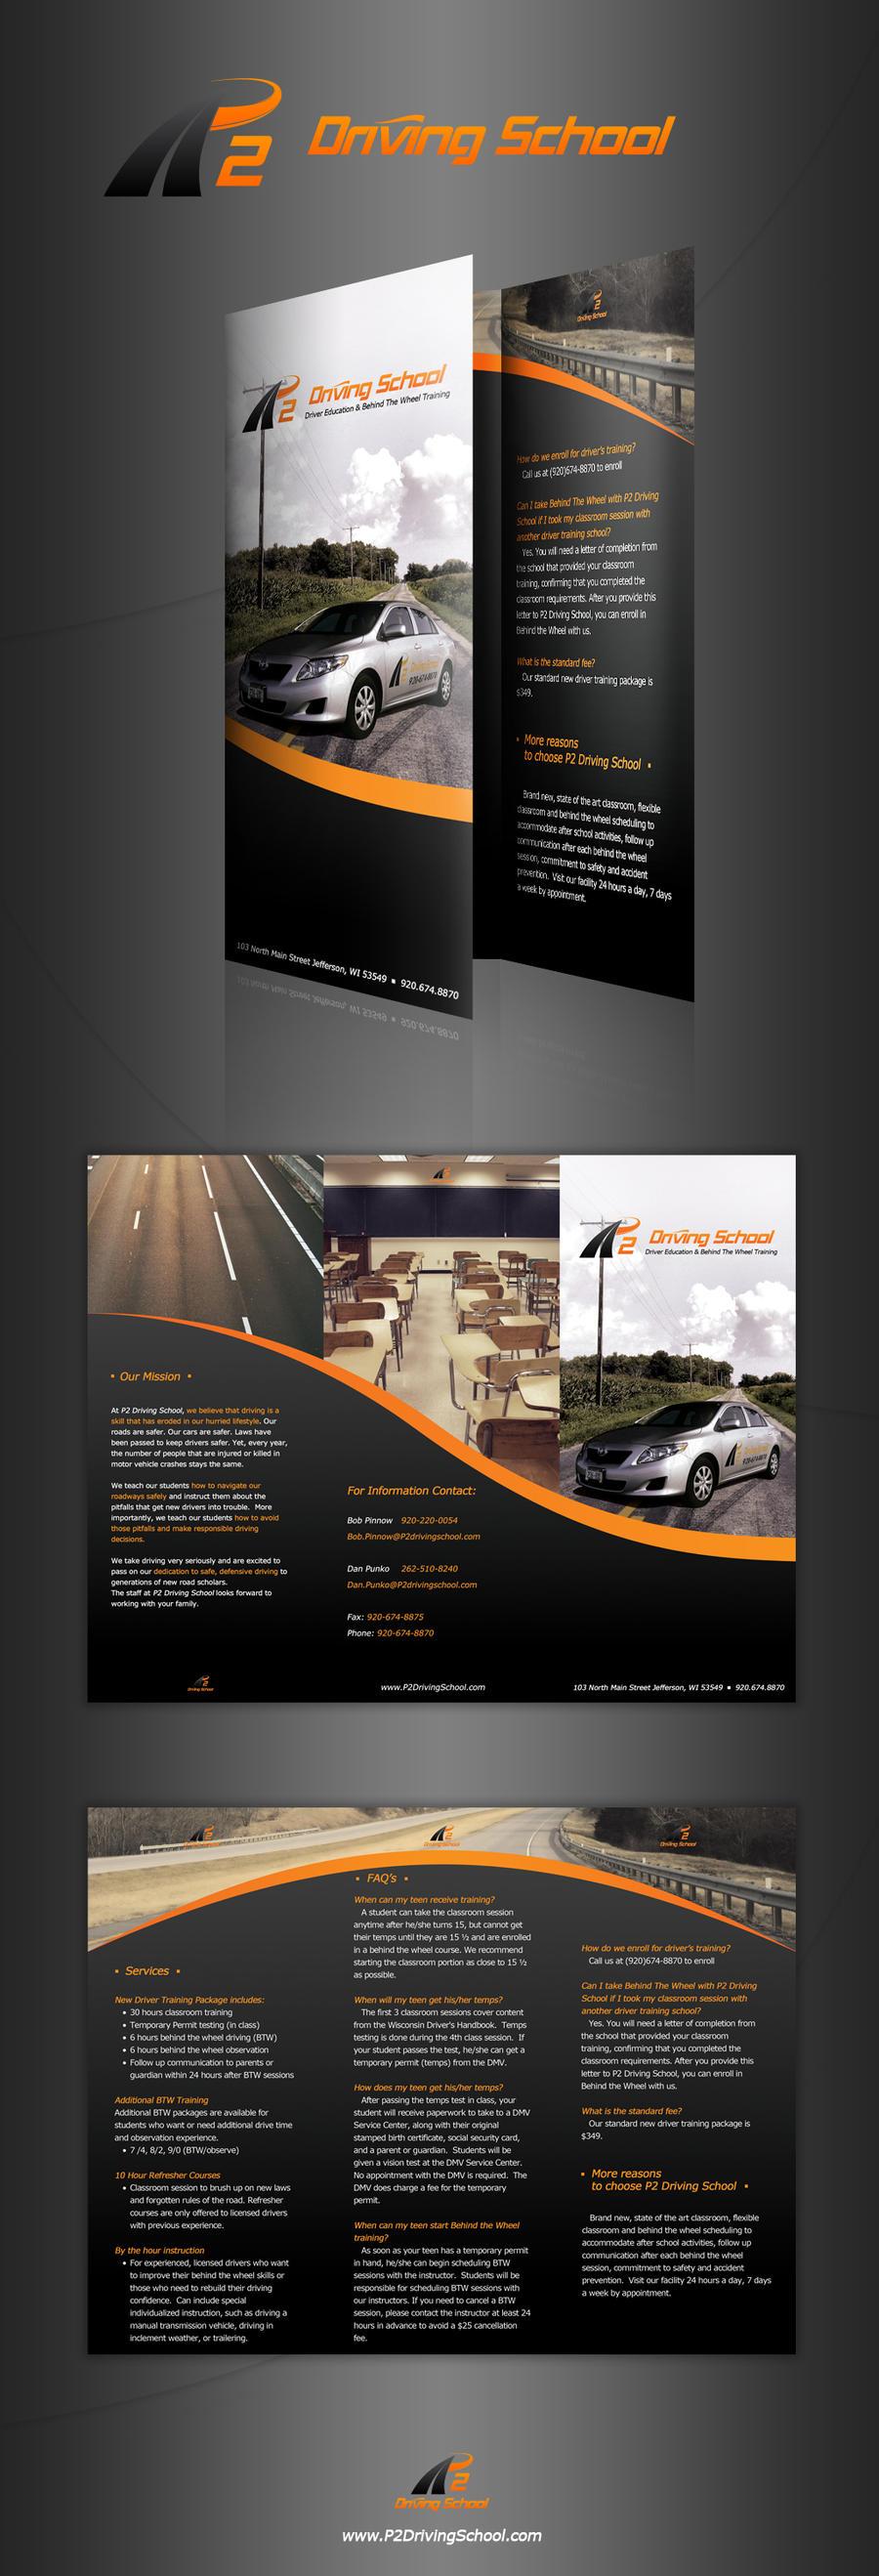 school brochure design templates - p2 driving school brochure by designphilled on deviantart